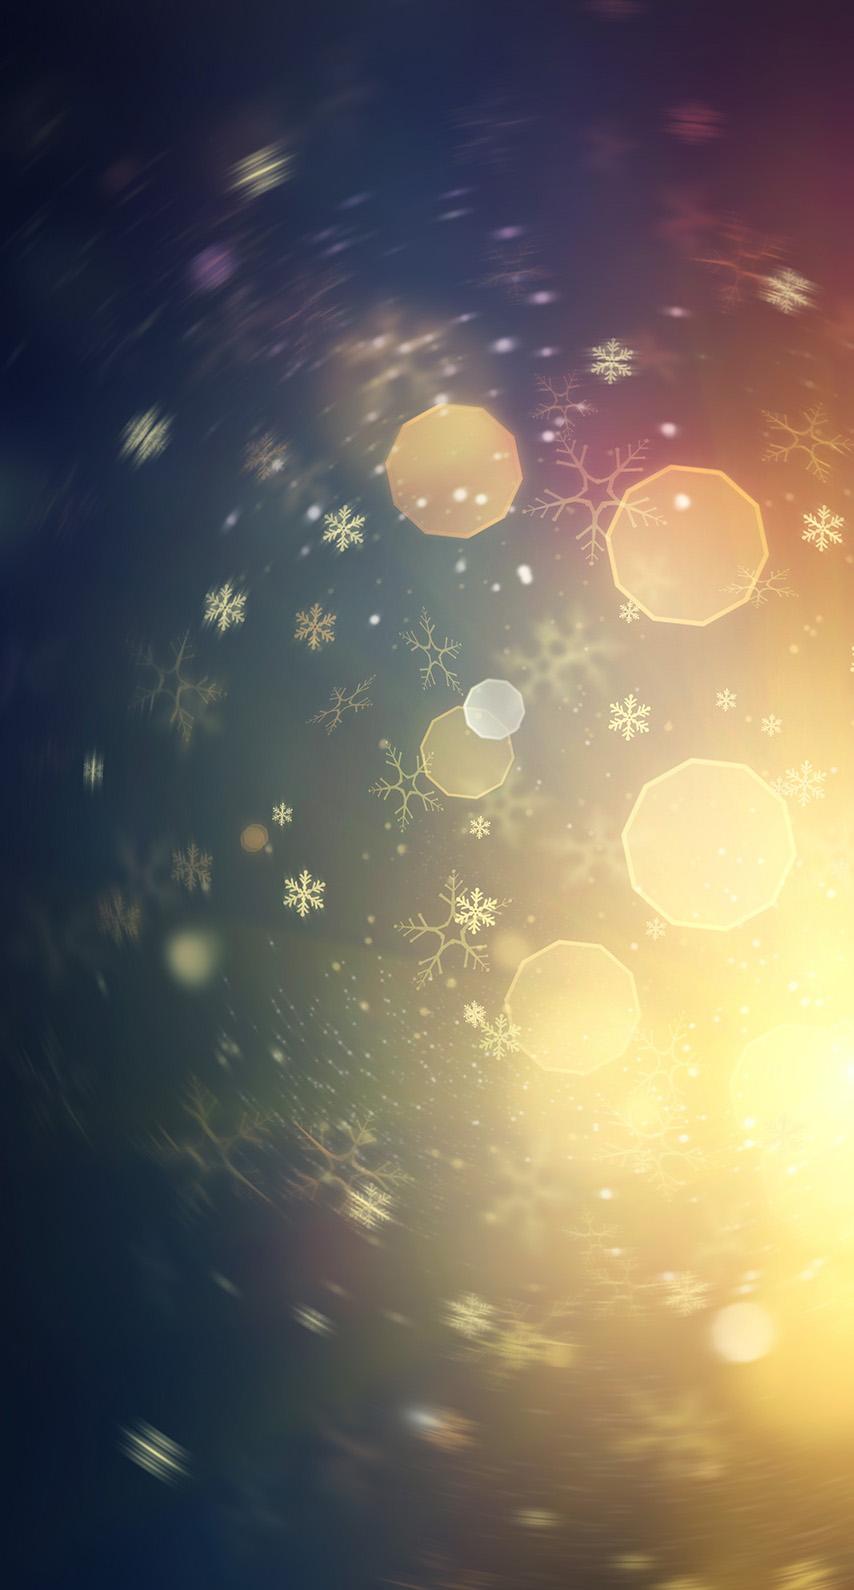 desktop, blur, luminescence, astronomy, shining, glisten, eve, illuminated, sparkling